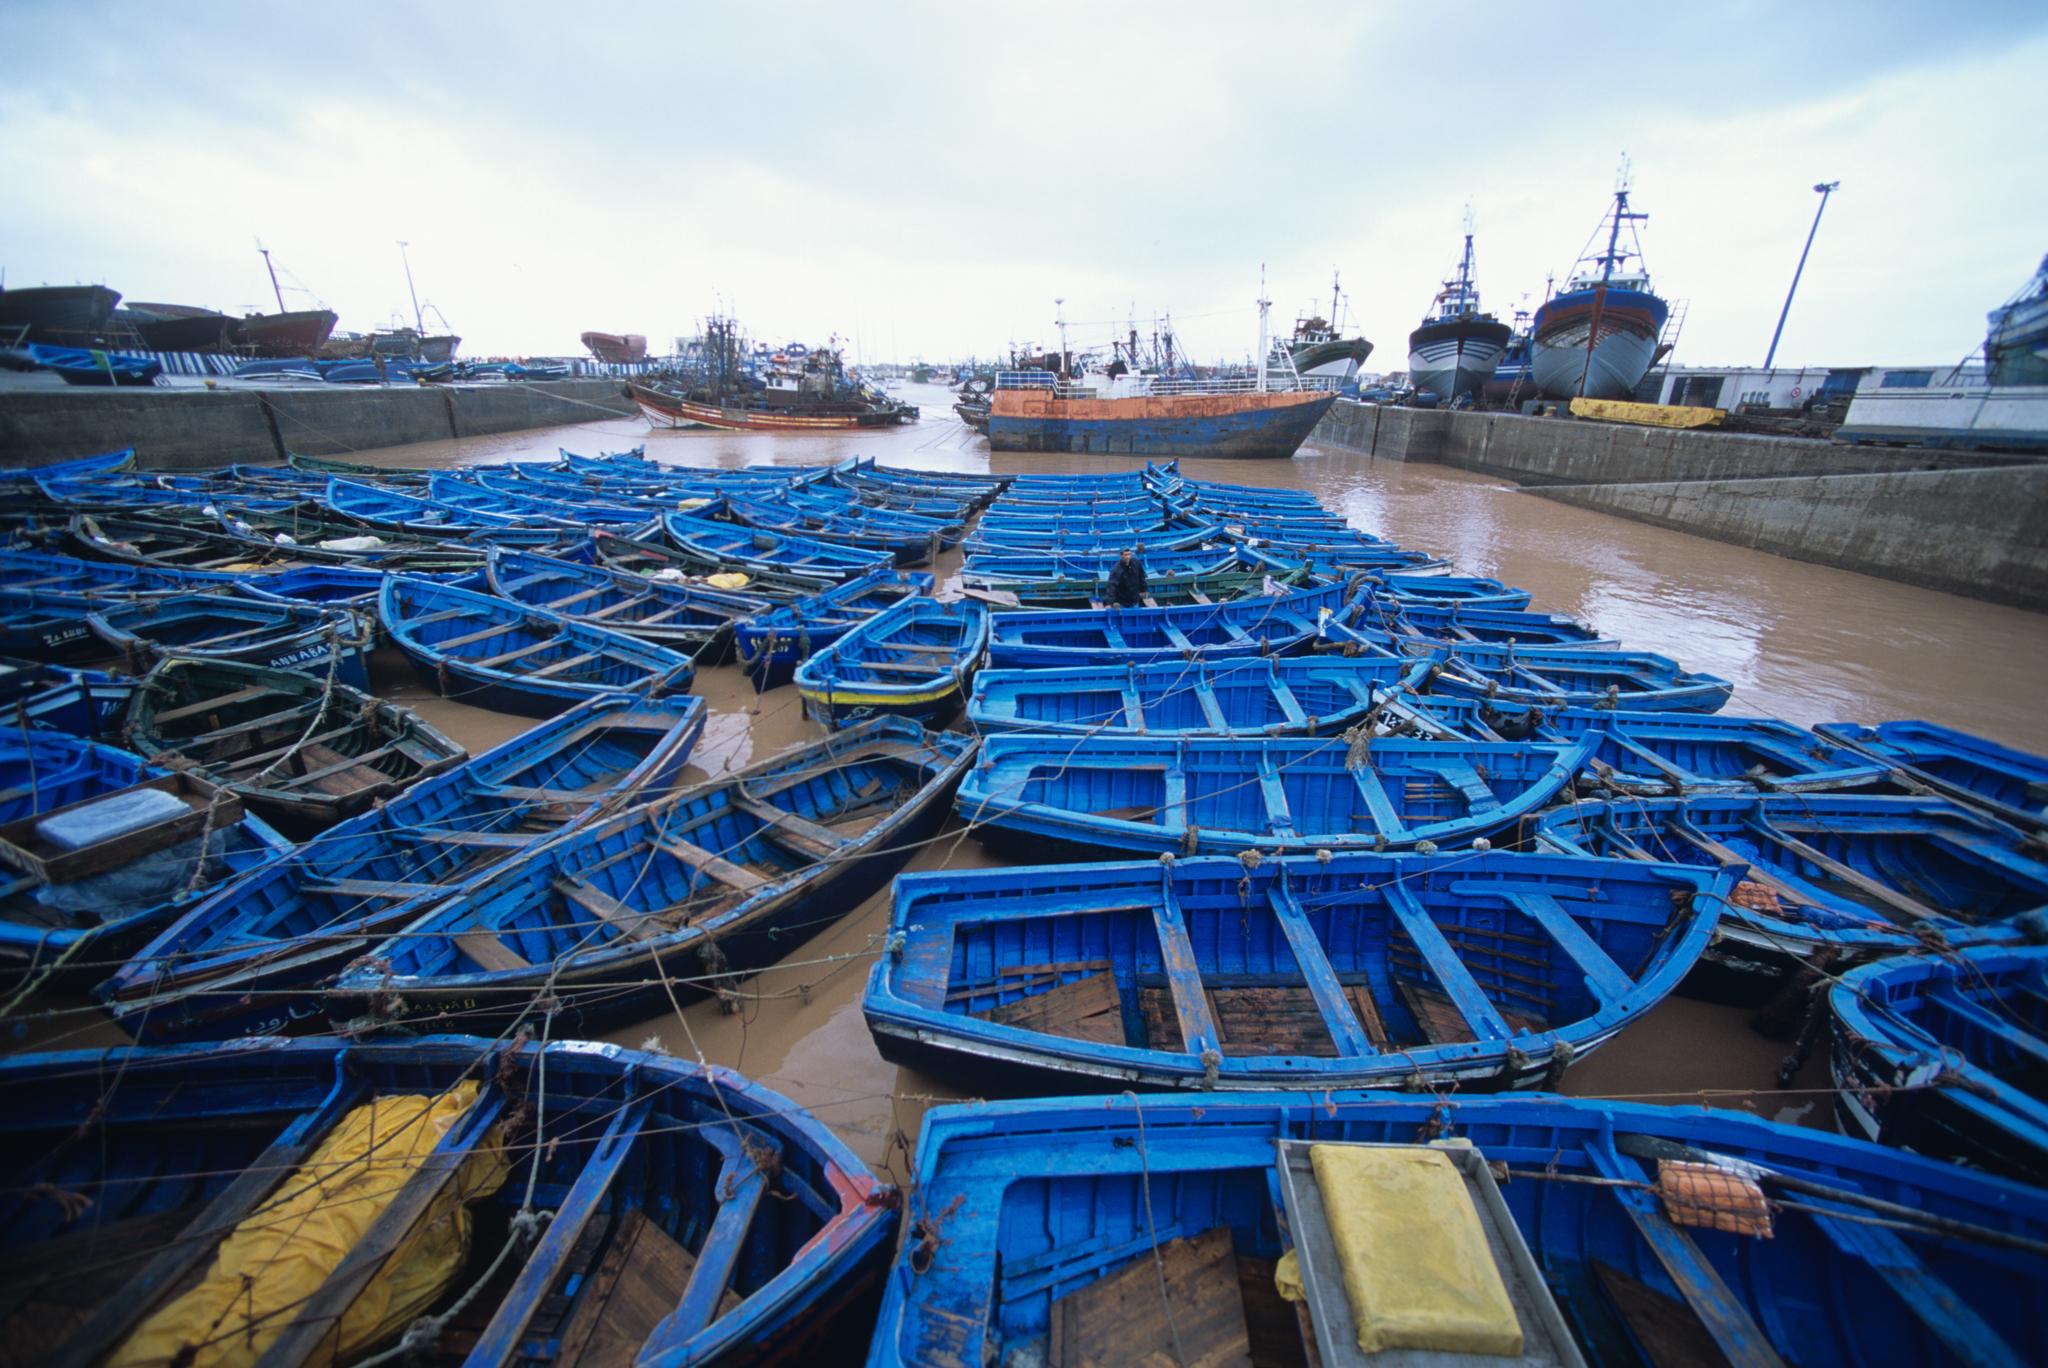 Fishing dories at Essaouira, Morocco. © Jeff Rotman / jeffrotman.com